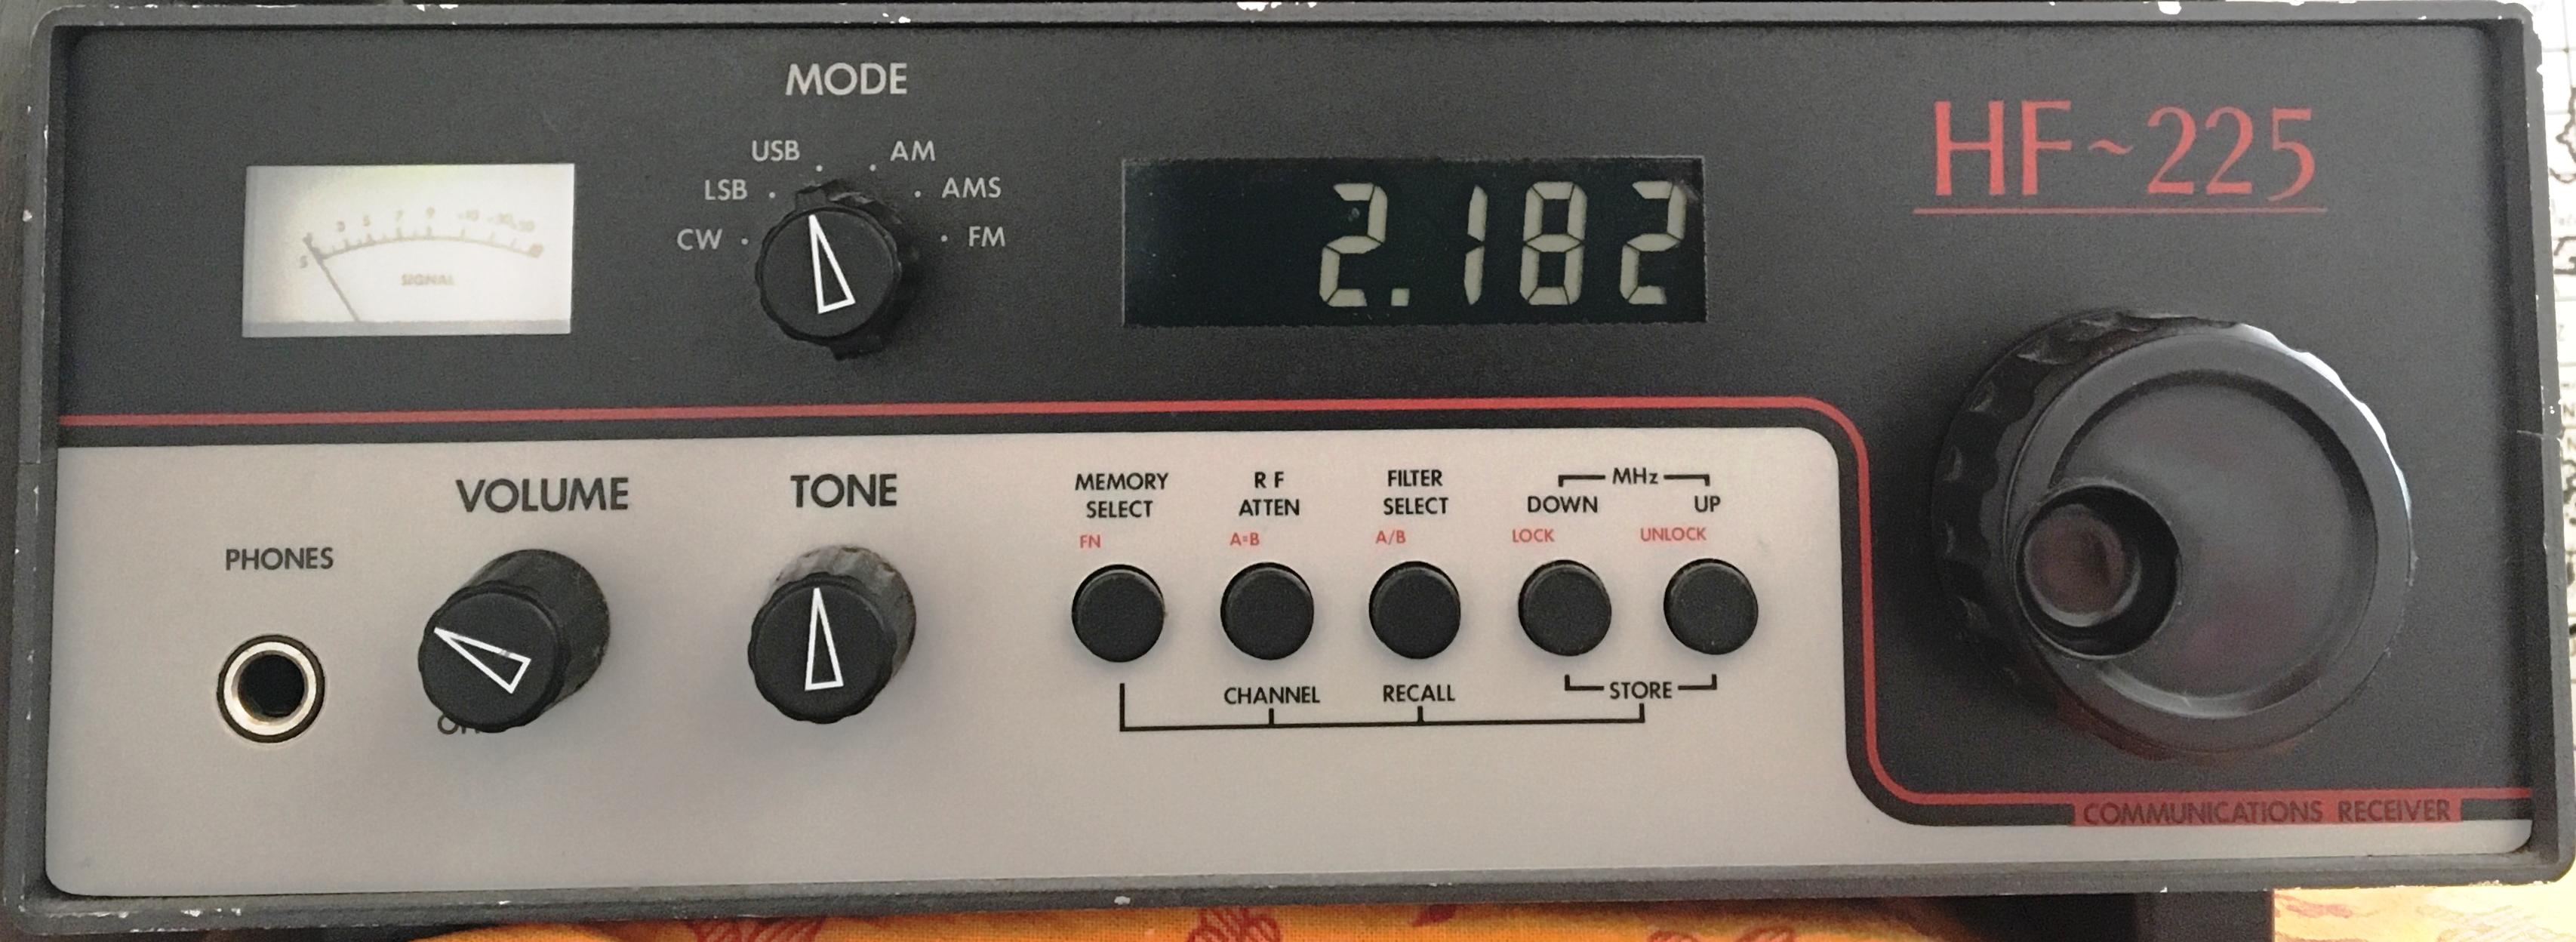 File:LOWE HF 225 (Lightning 2182 kHz USB).png